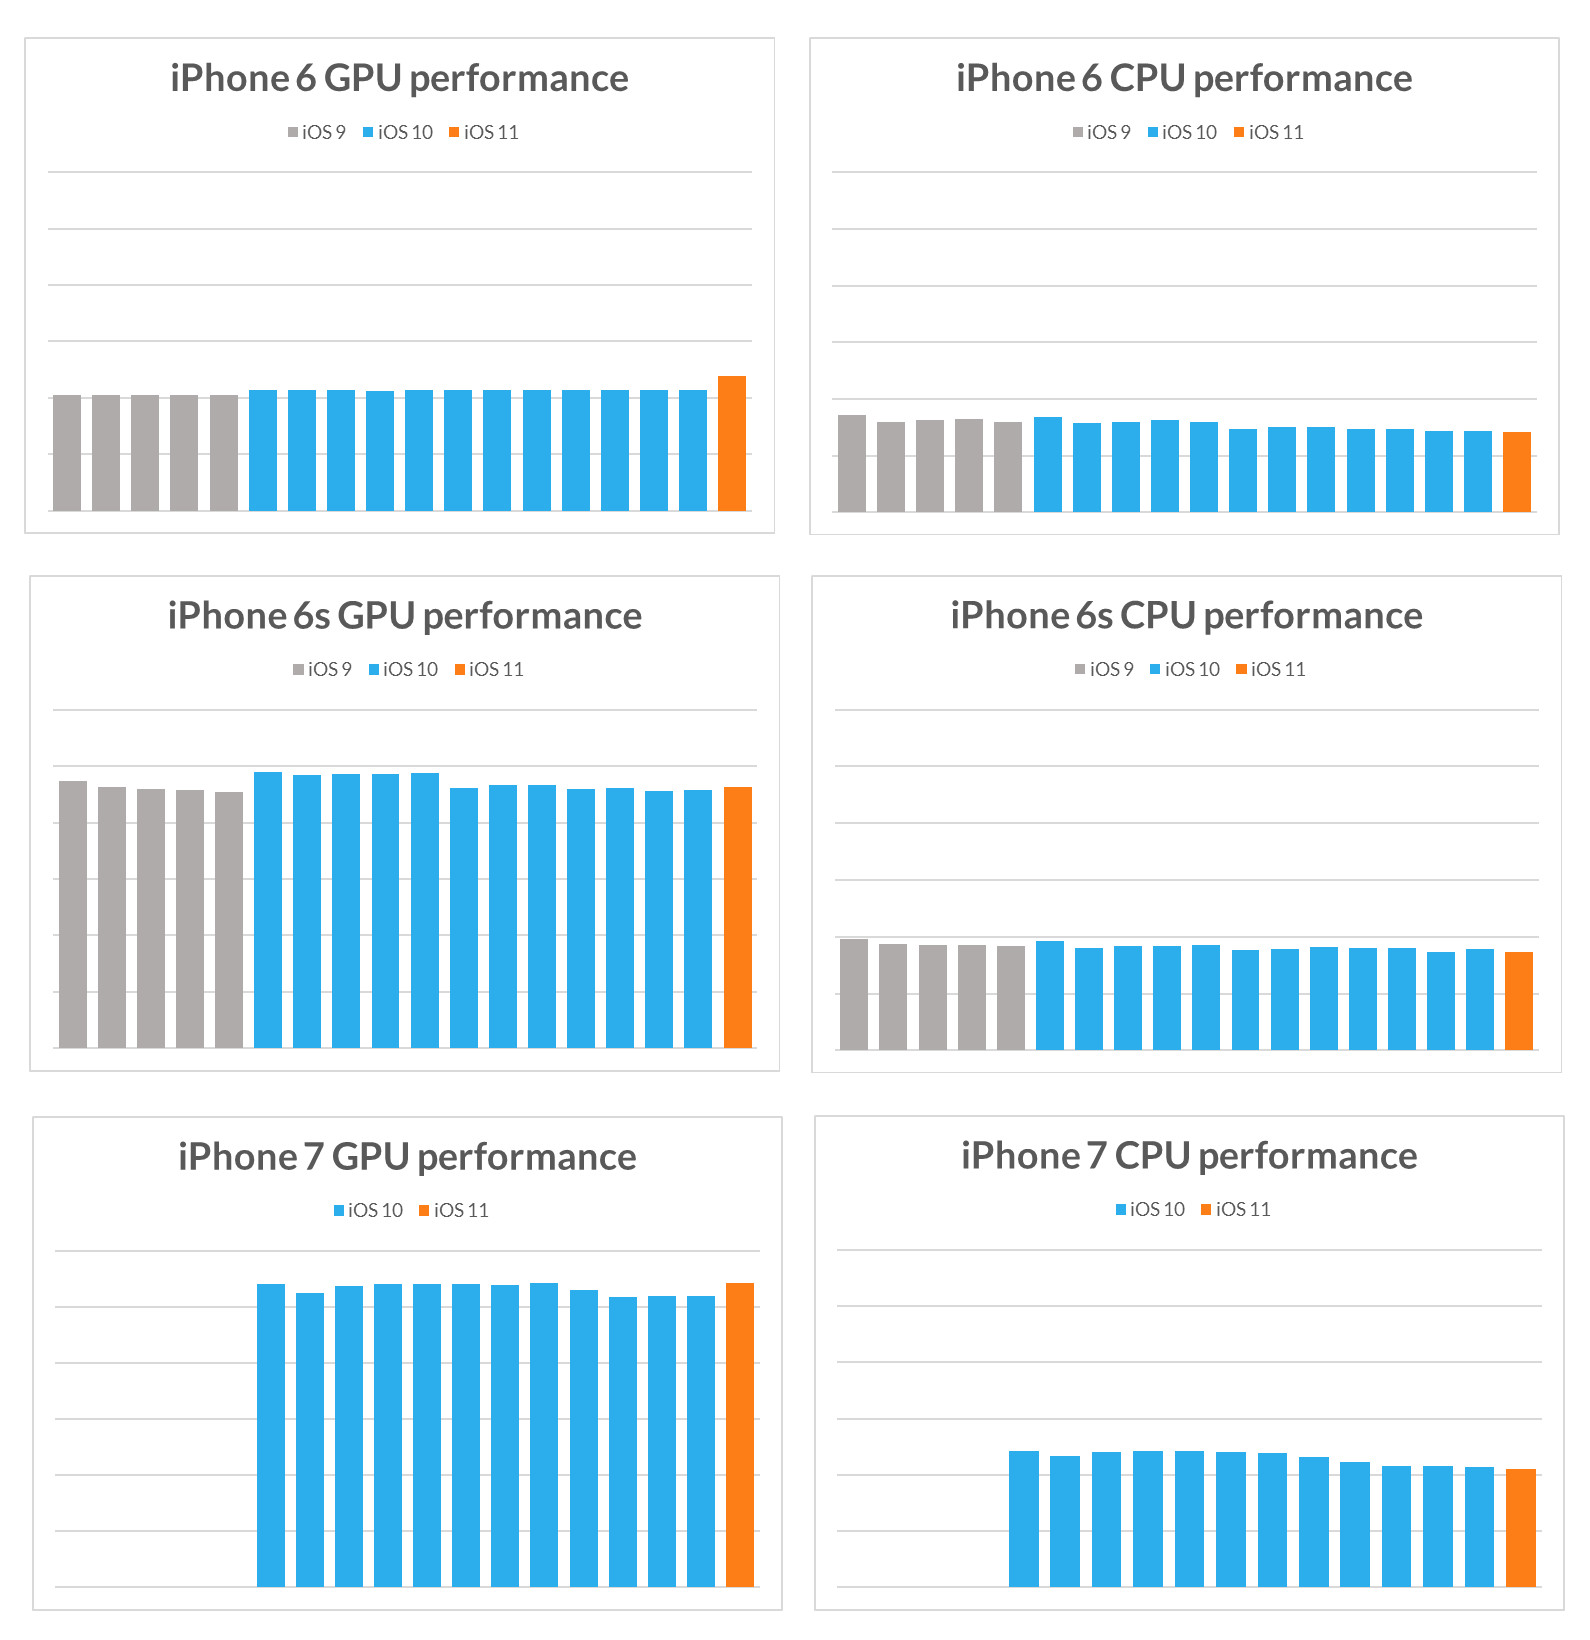 Histórico de benchmarks dos iPhones 6, 6s e 7